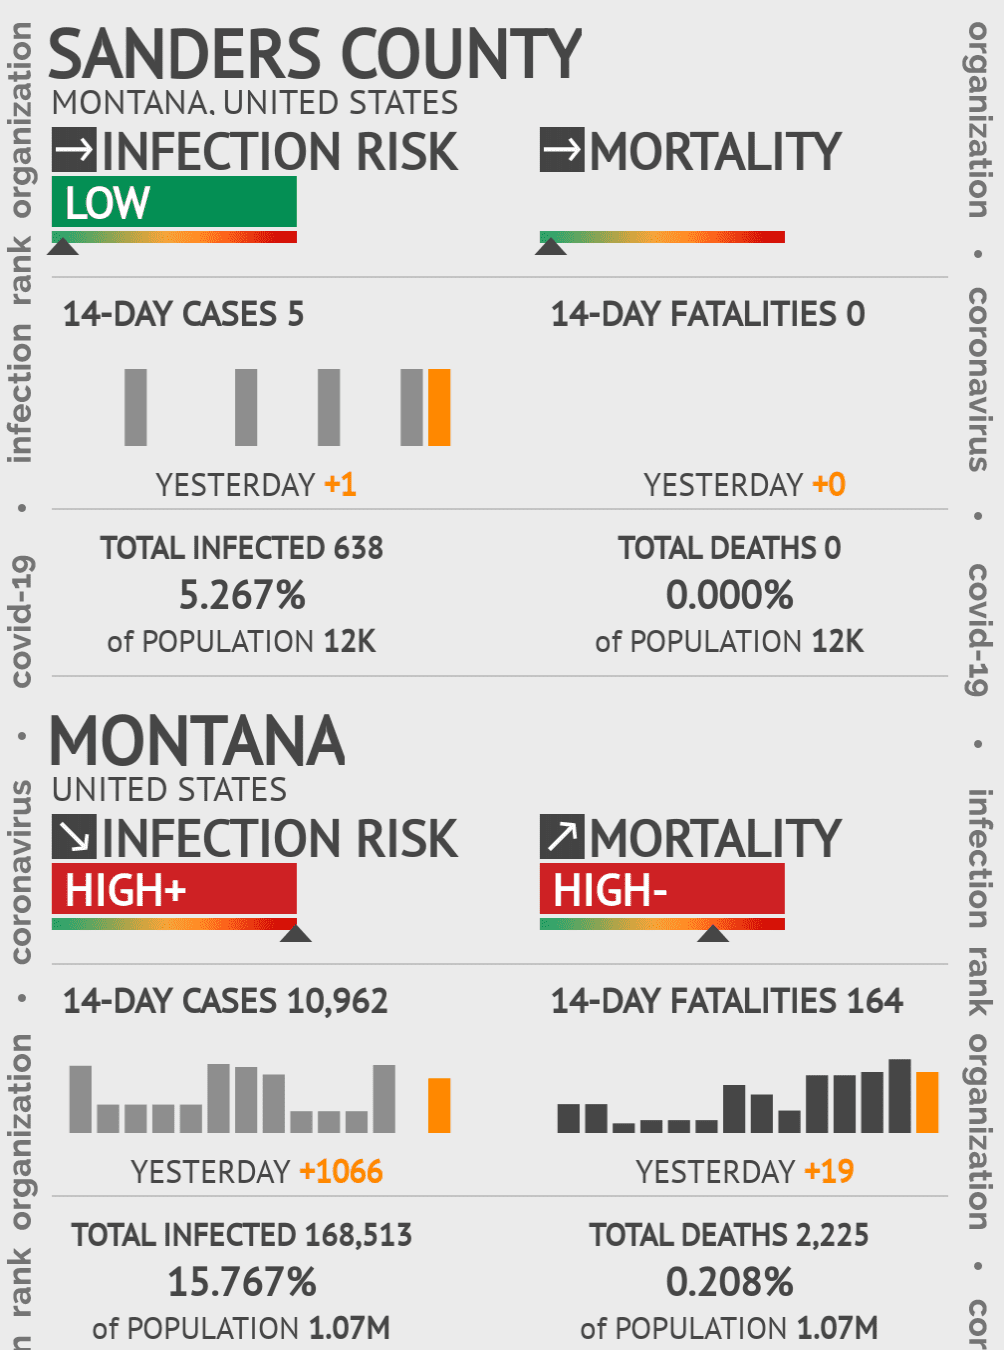 Sanders County Coronavirus Covid-19 Risk of Infection on February 25, 2021